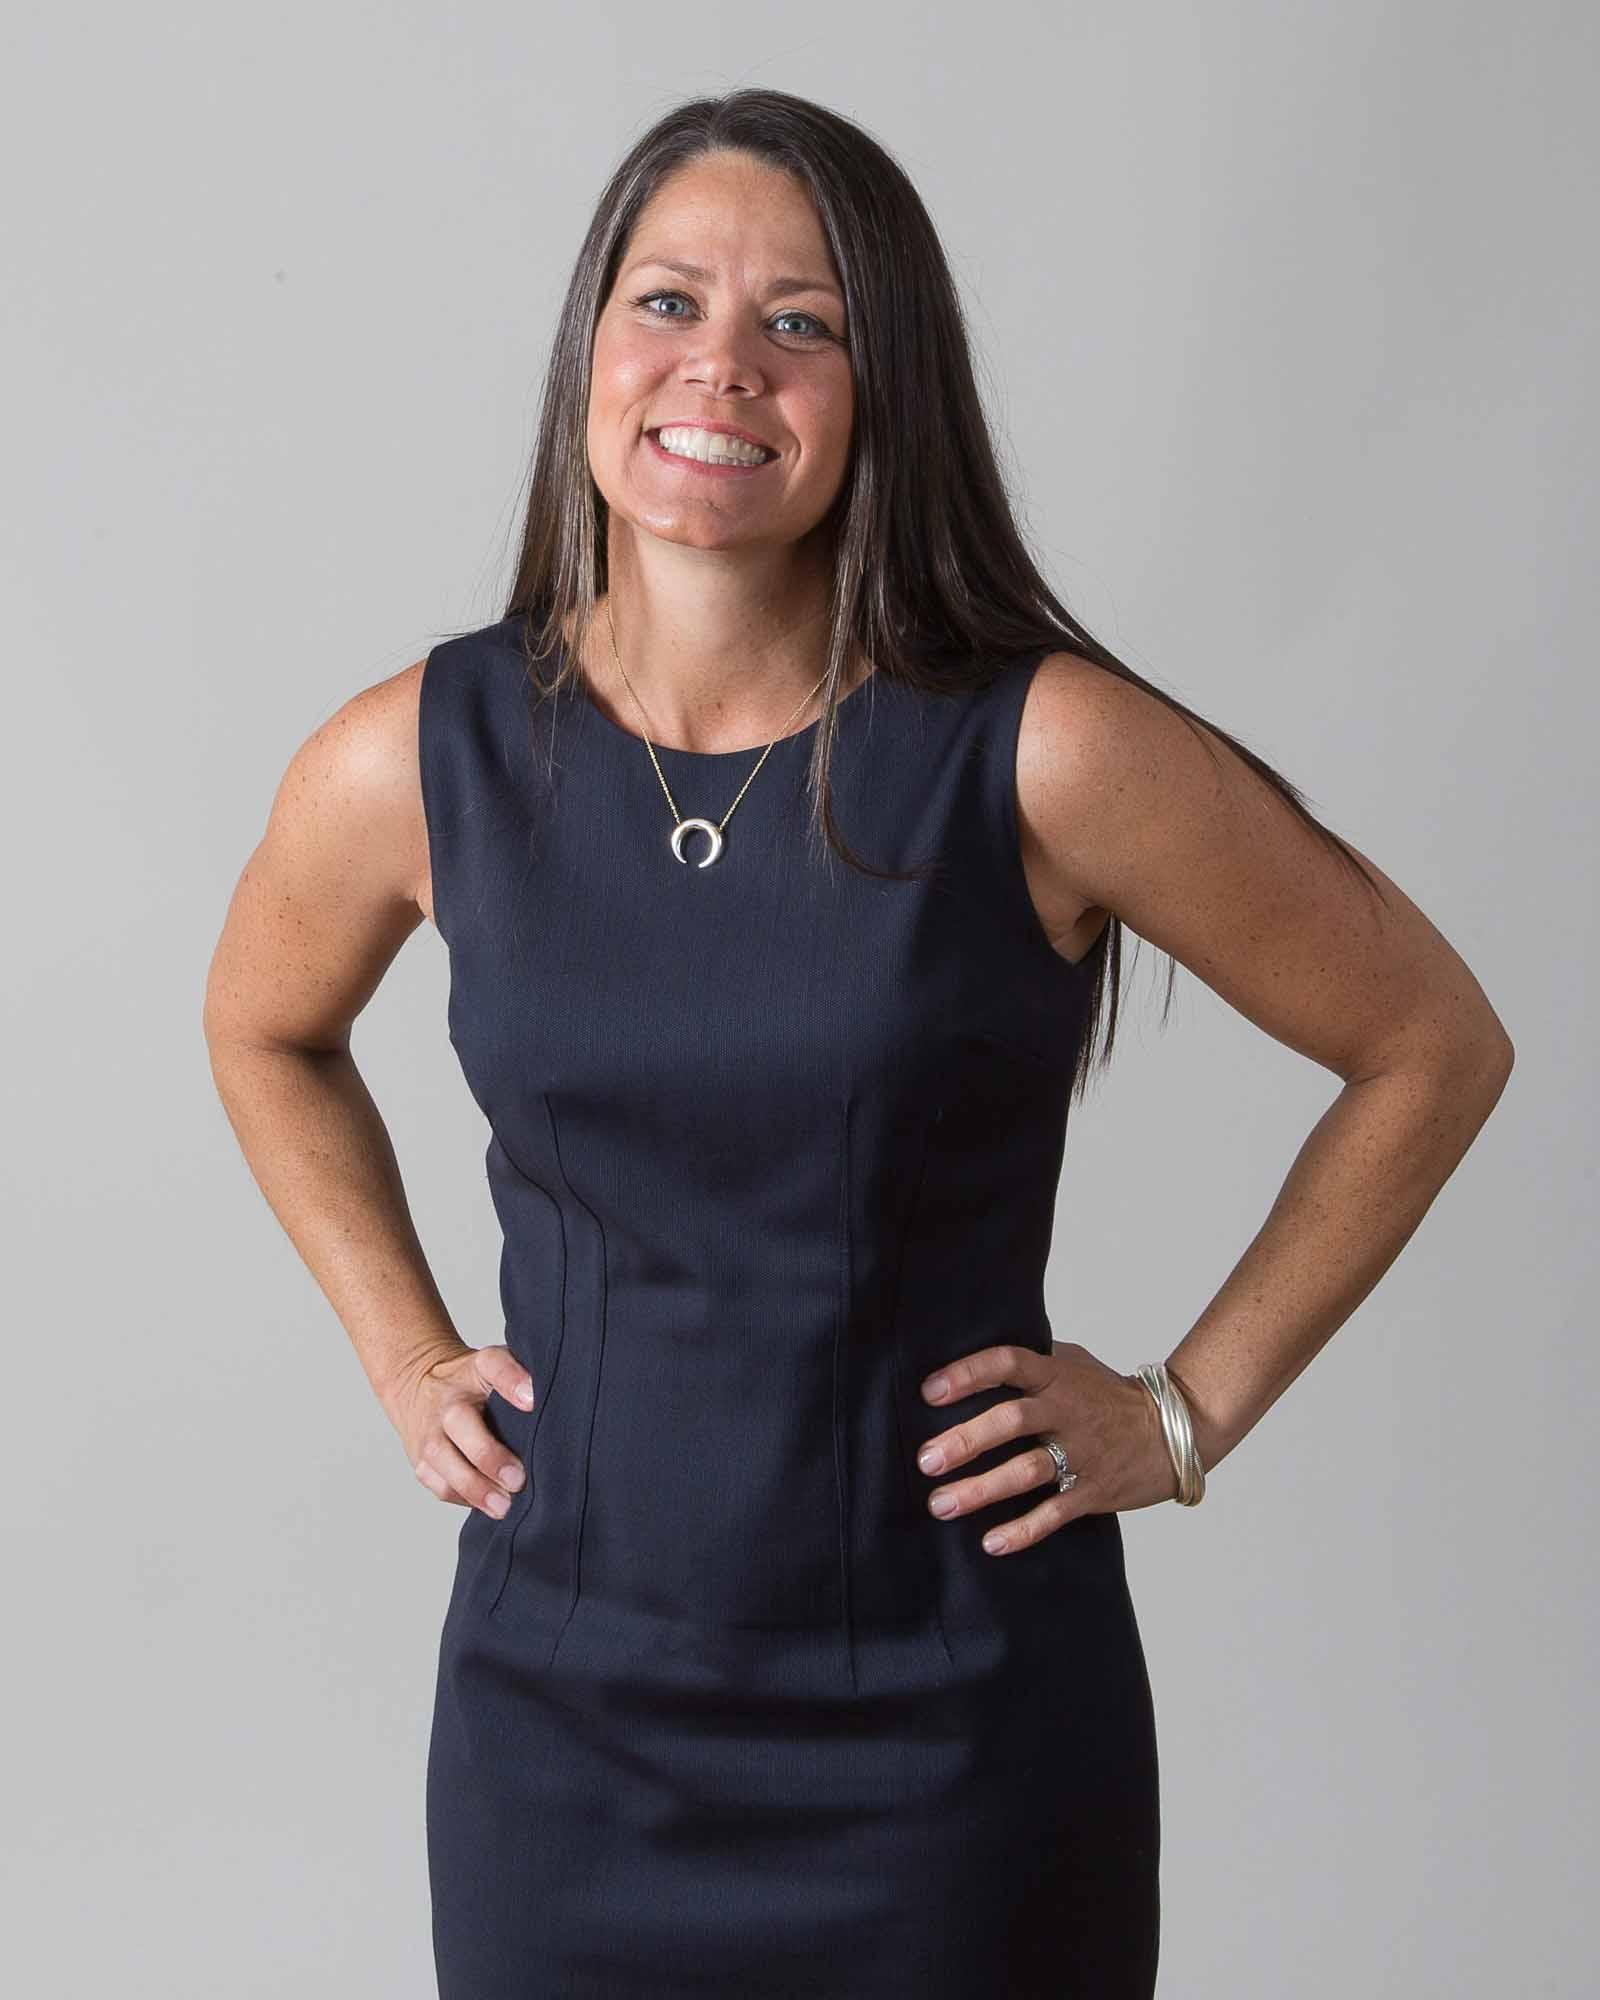 Christine McGrath Breuer